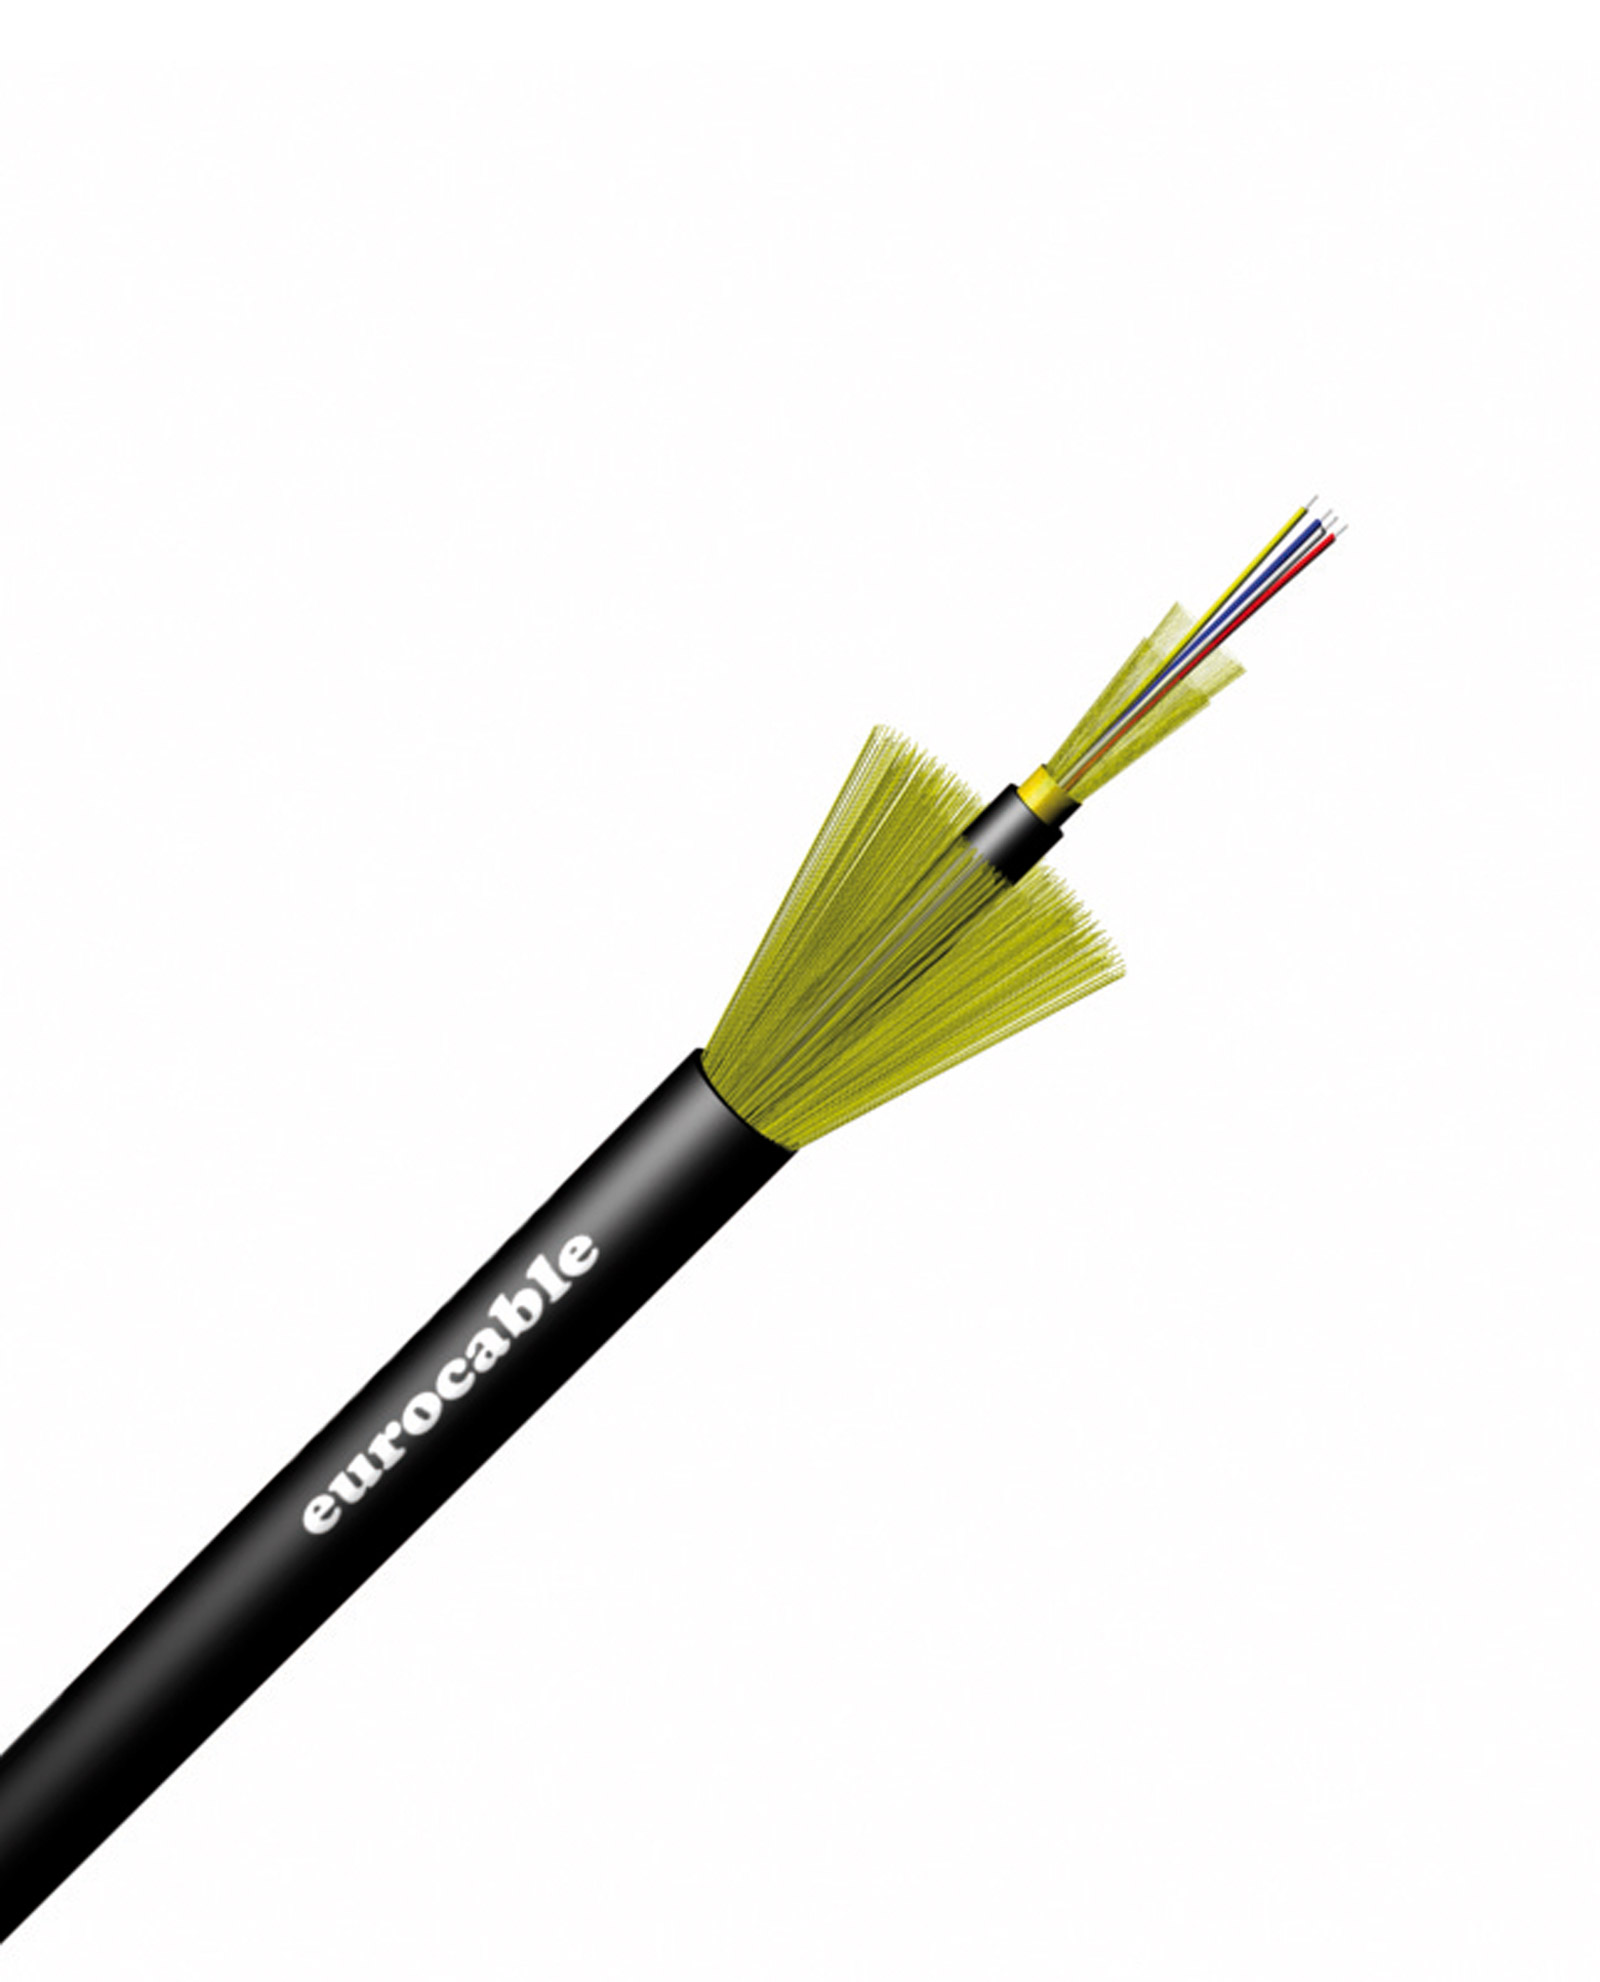 Eurocable Multicore Unbreakable Single Mode Fibre Optic Cable 7.10mm